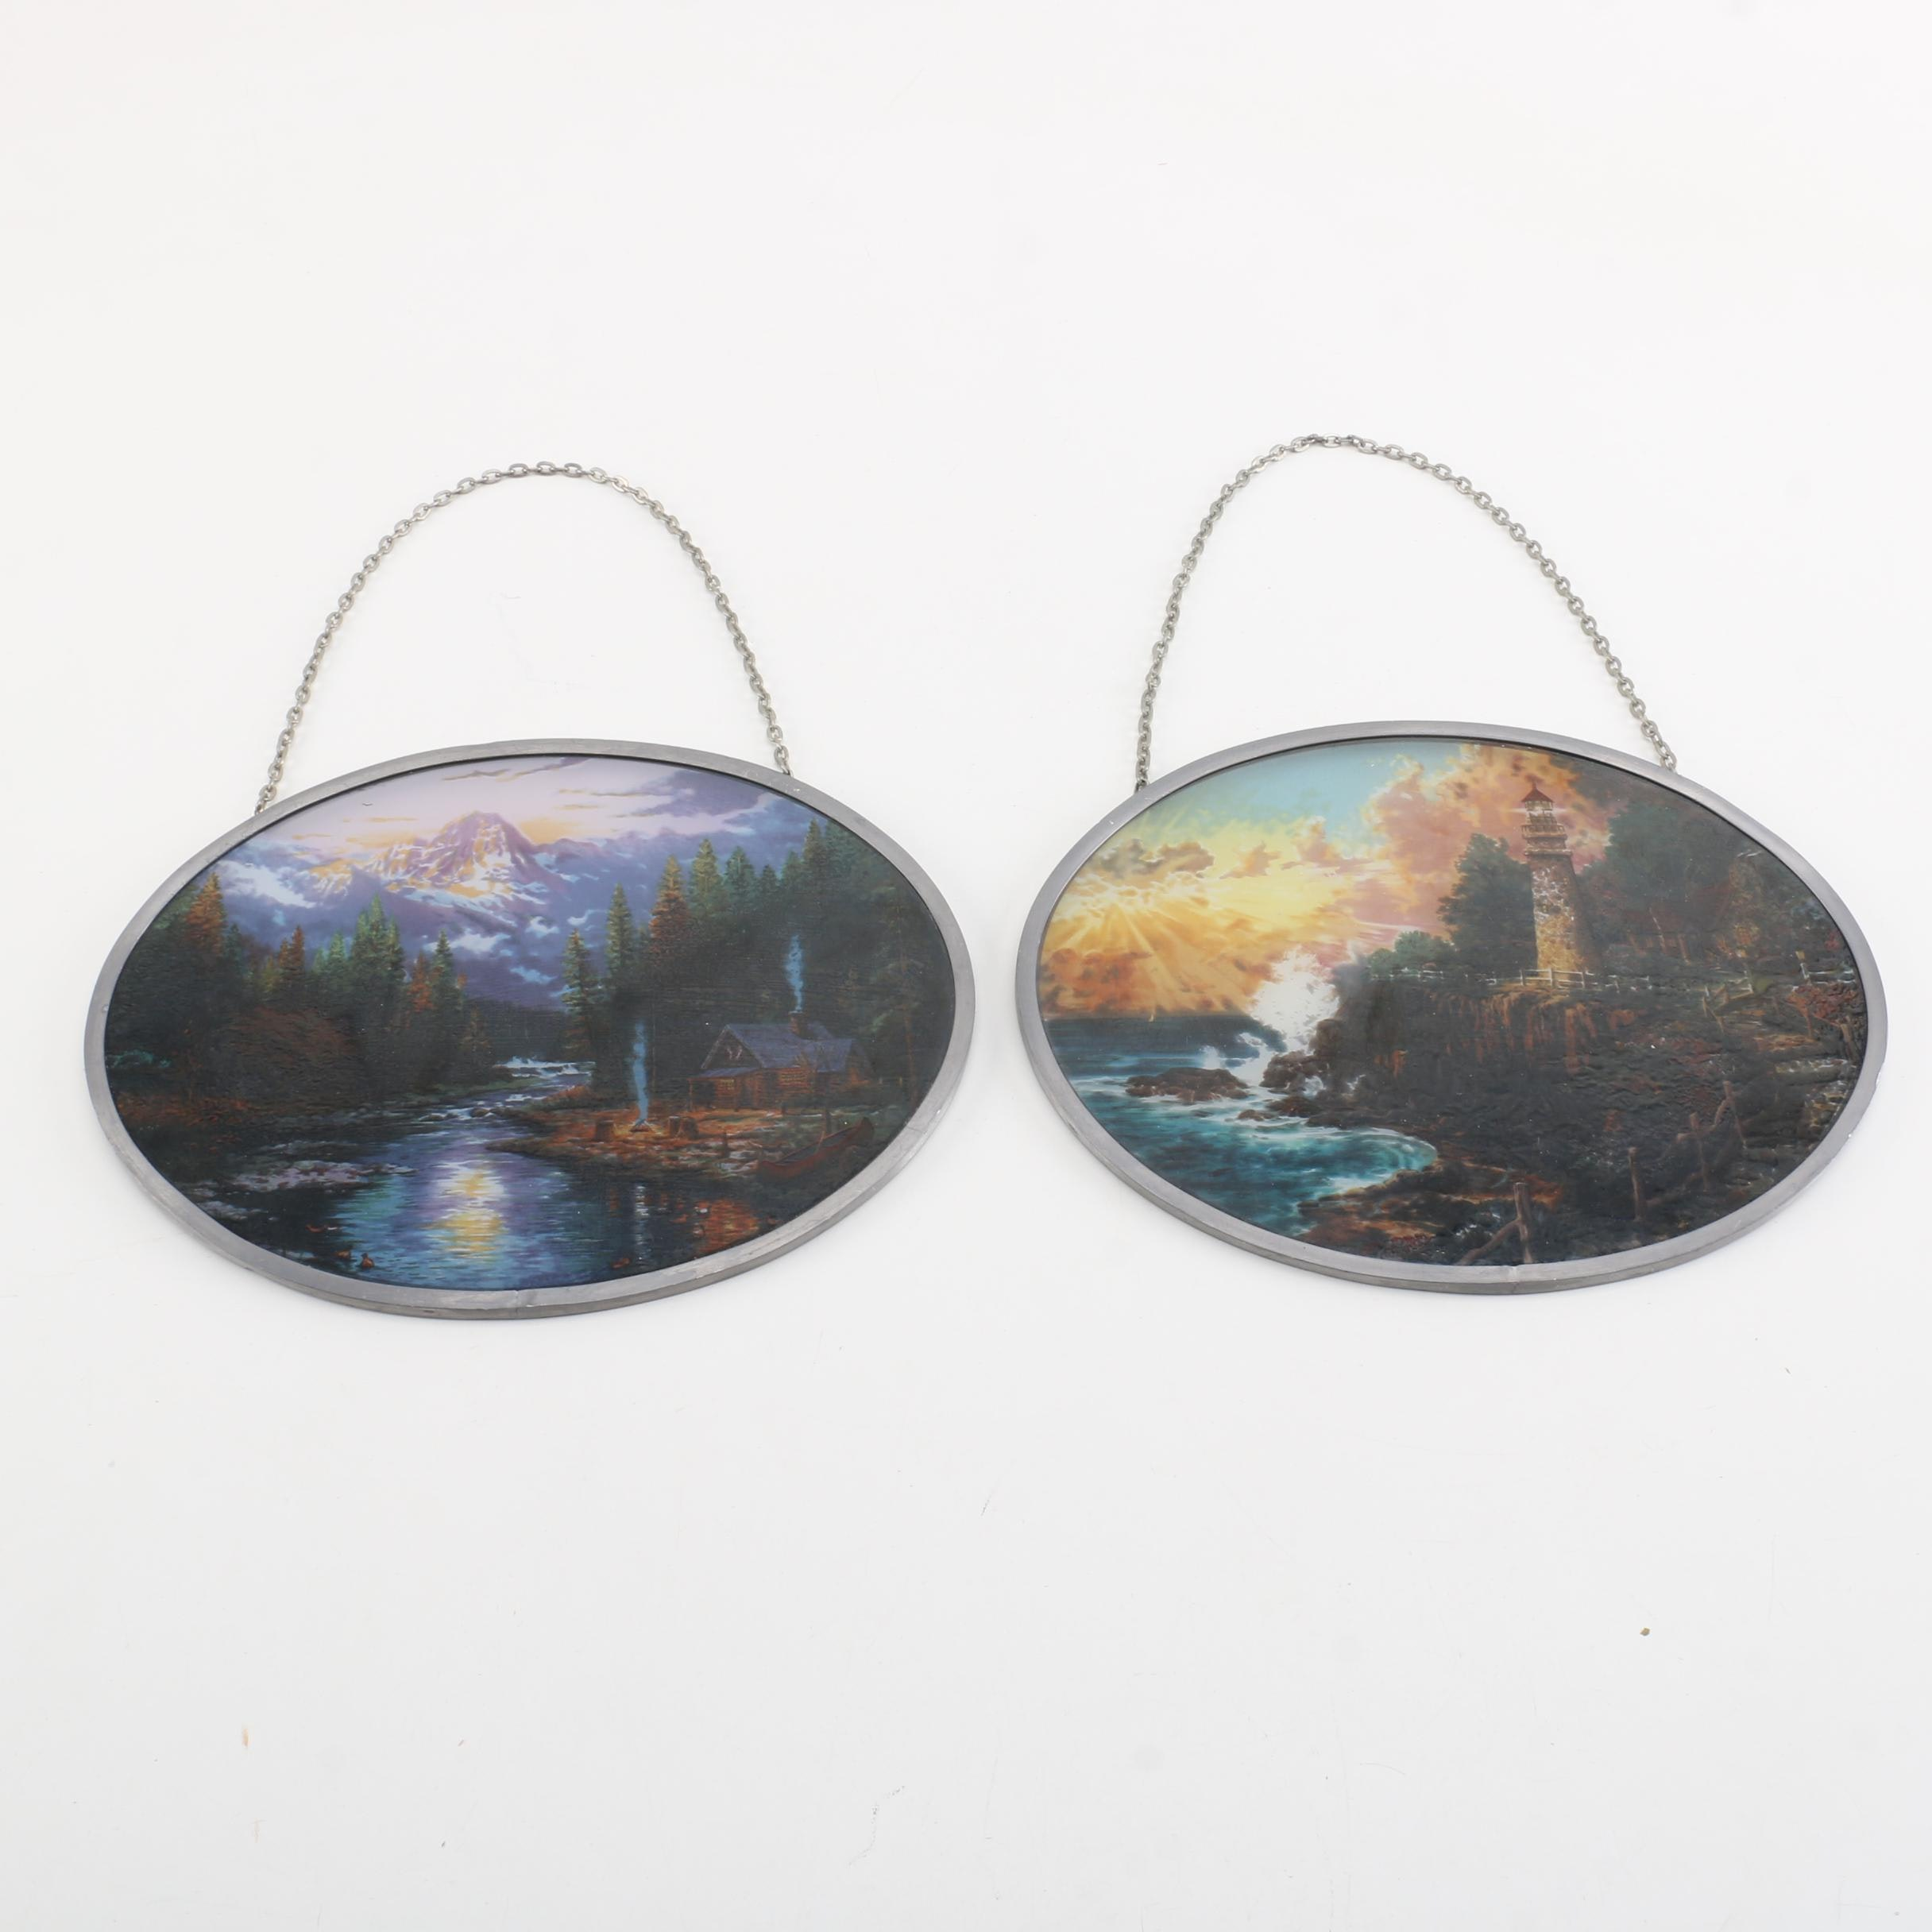 Hanging Framed Colored Glass Images